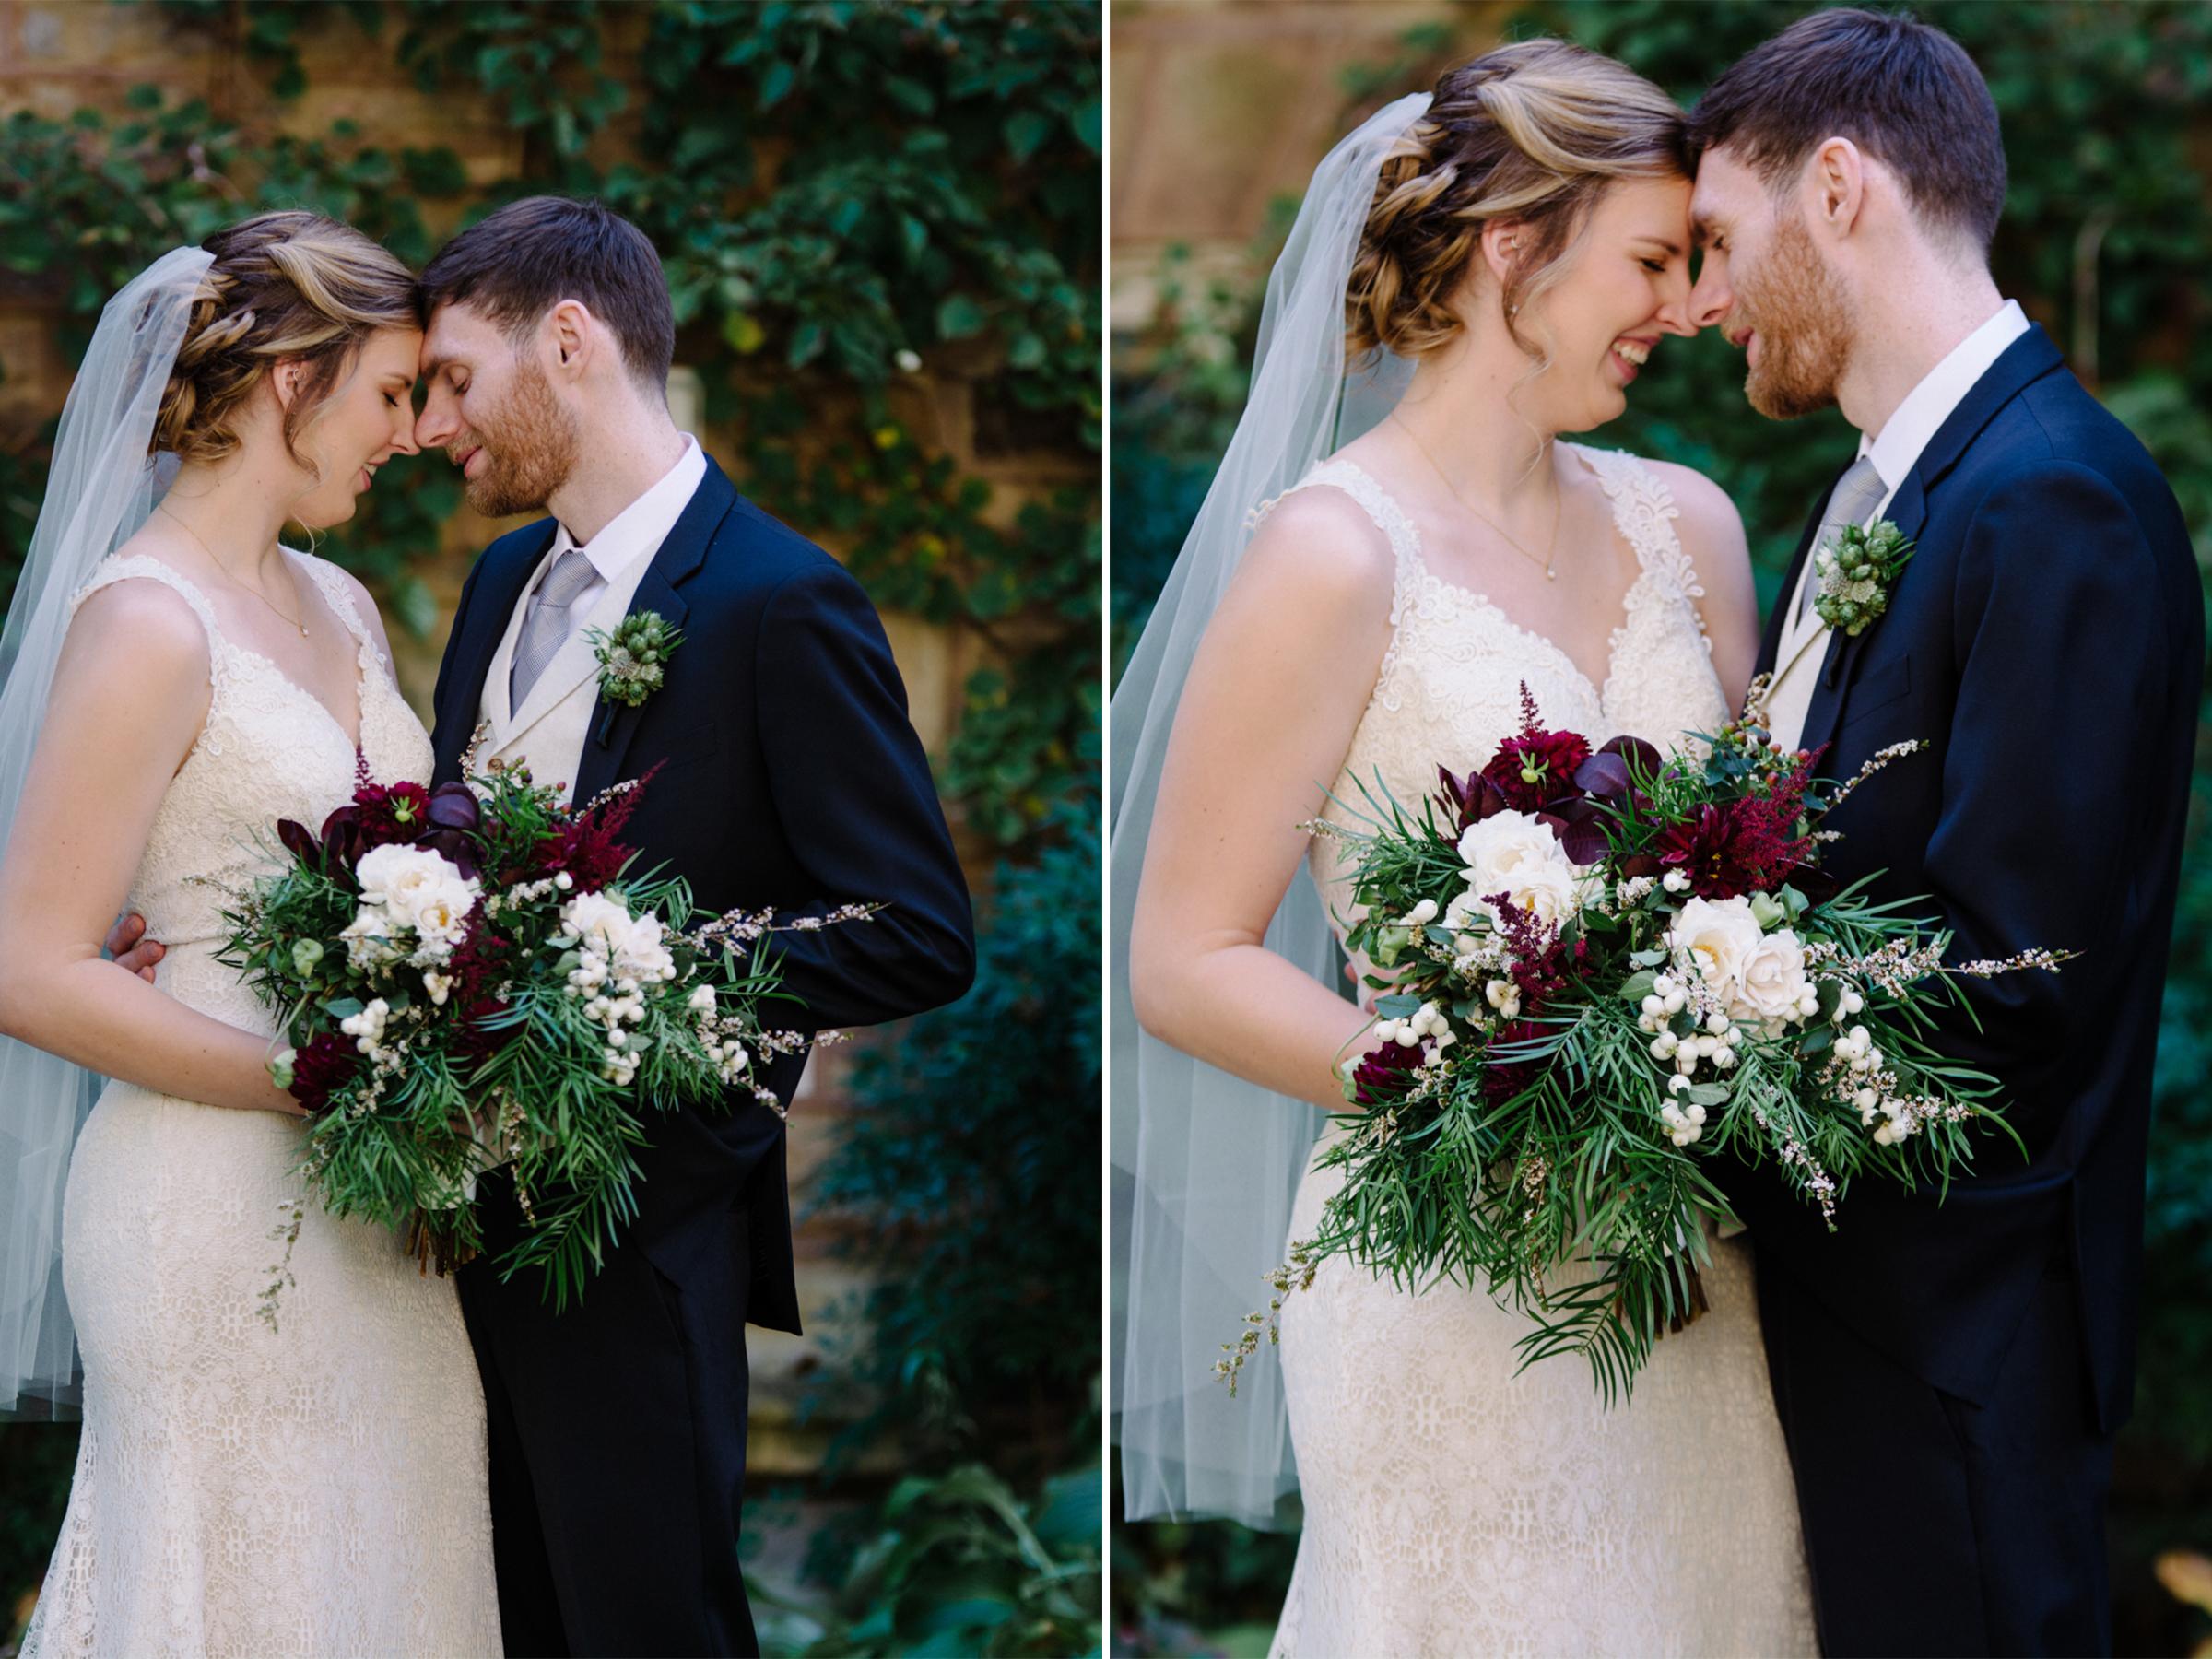 Chelsea+James- Bride and Groom Portraits- Princeton University Campus Wedding- Olivia Christina Photo.jpg